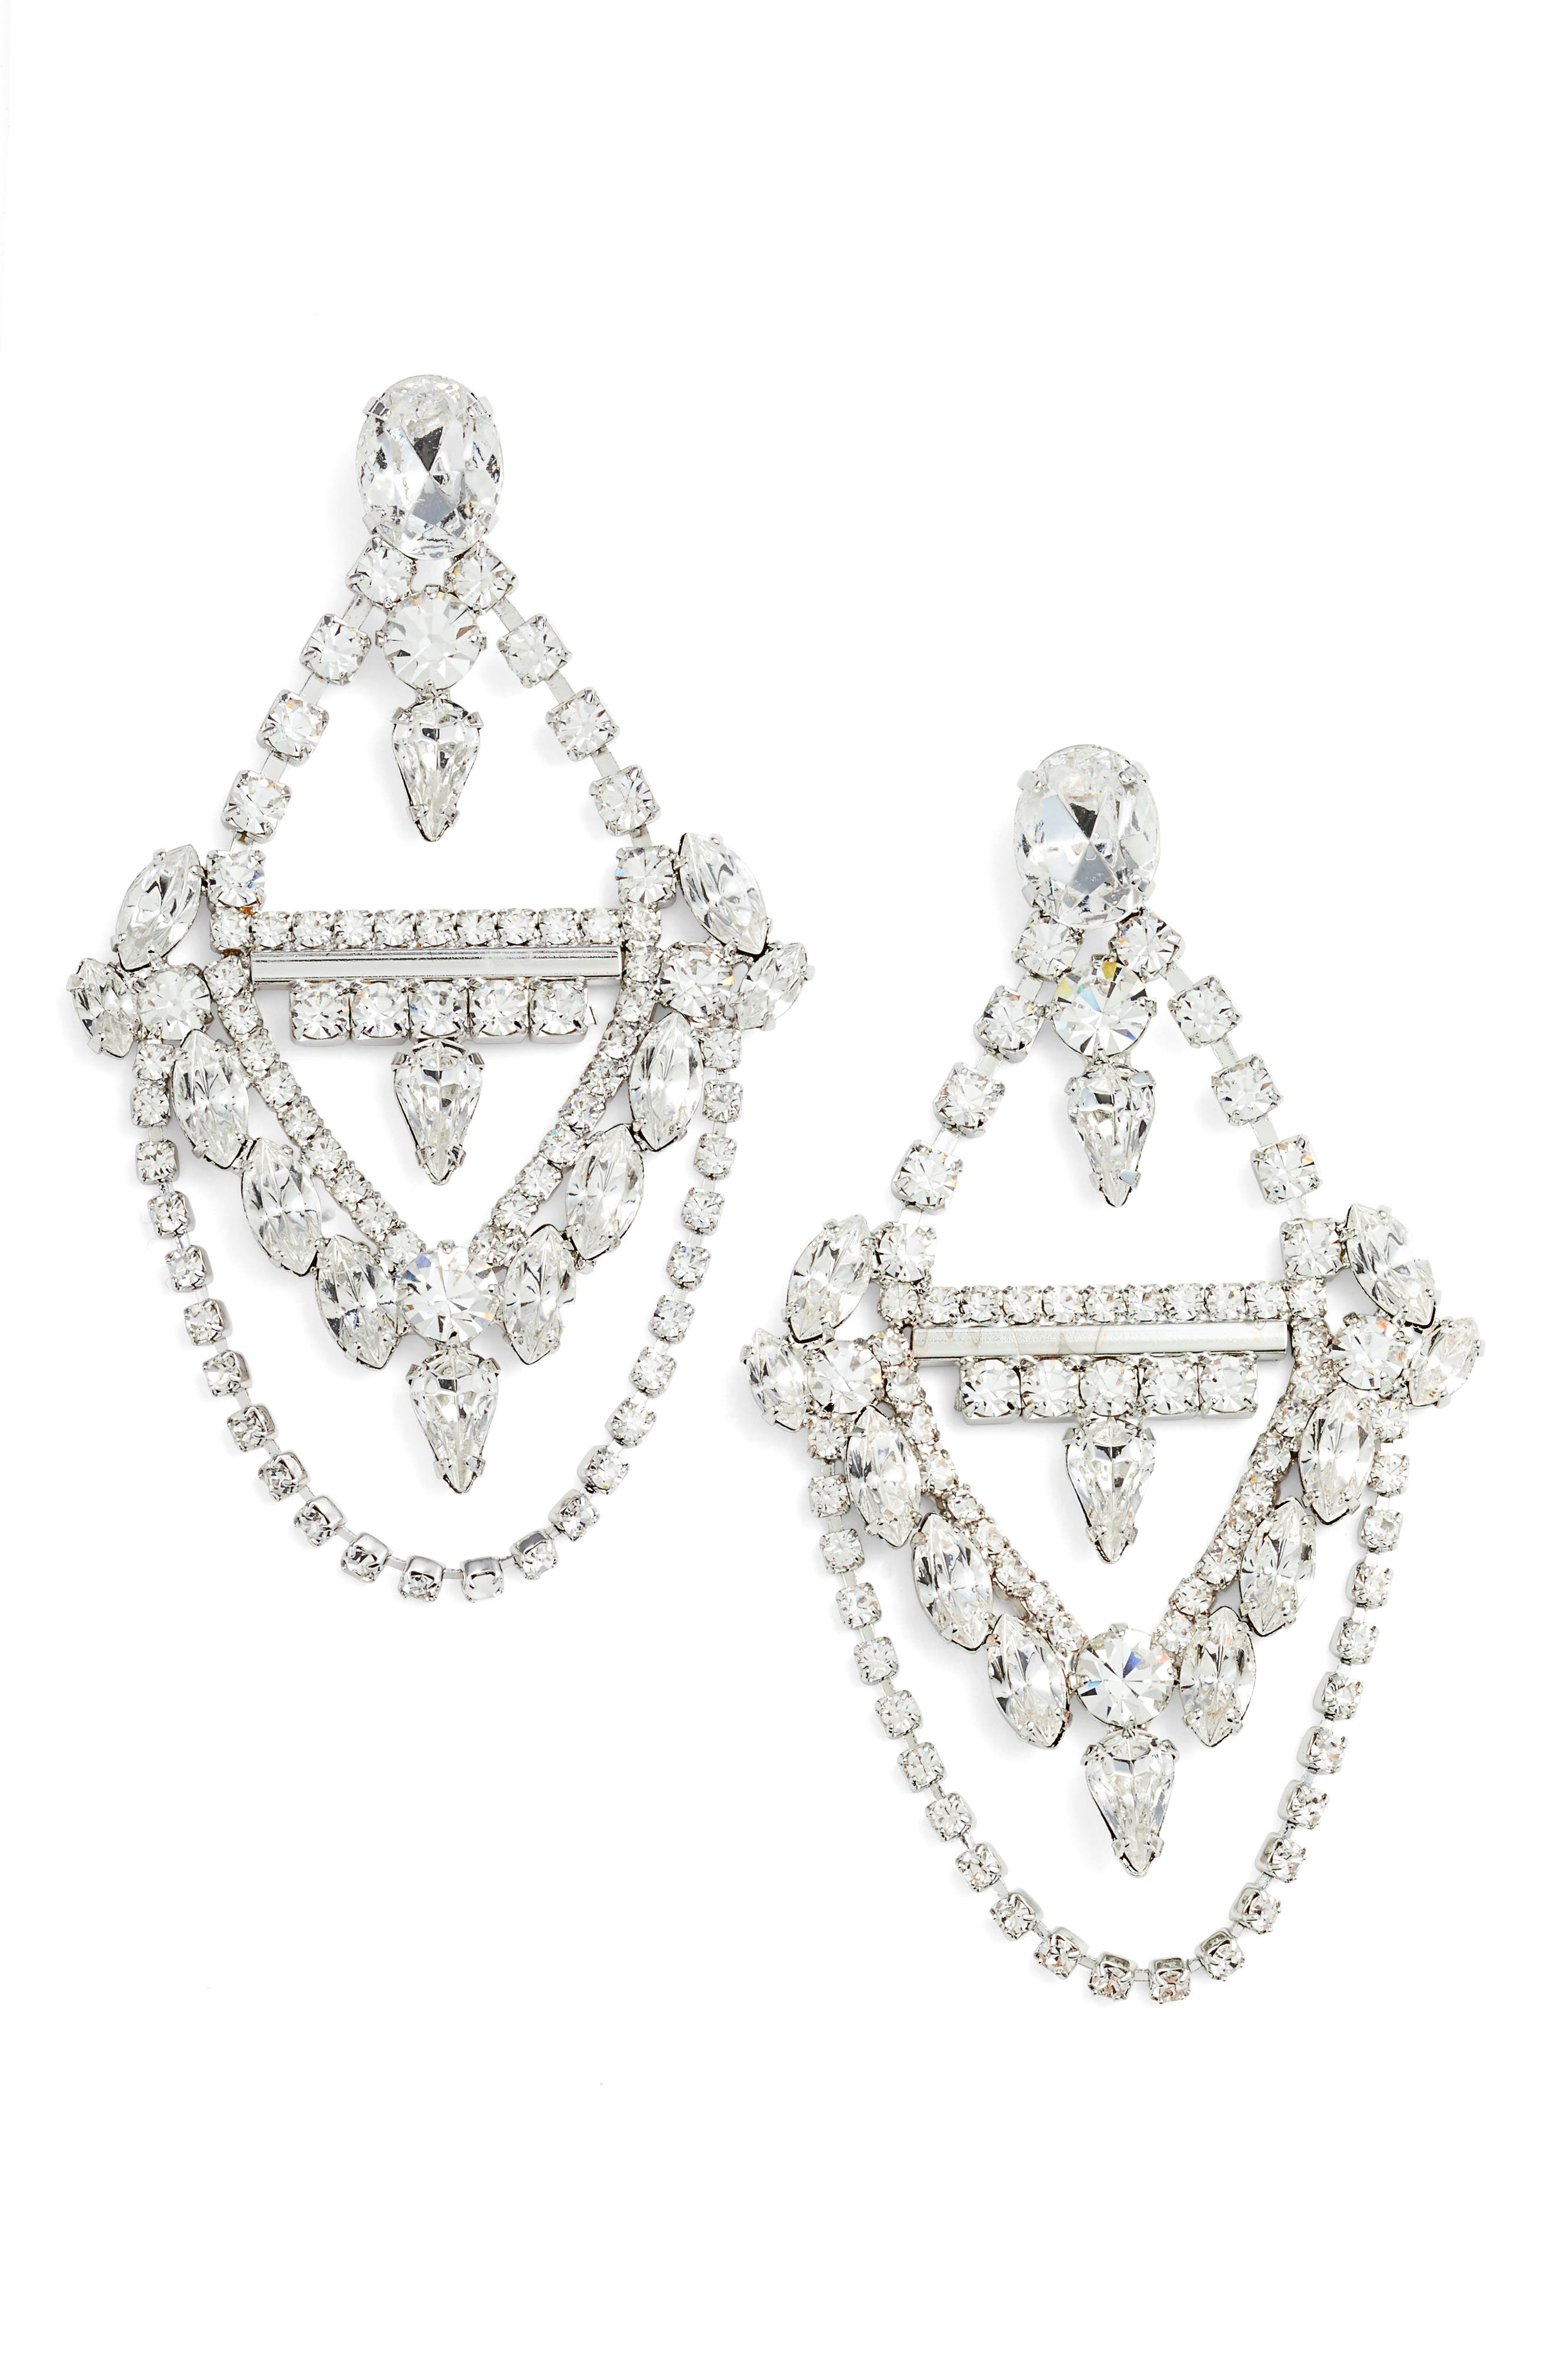 Crystal Chandelier Earrings,                             Main thumbnail 1, color,                             Silver